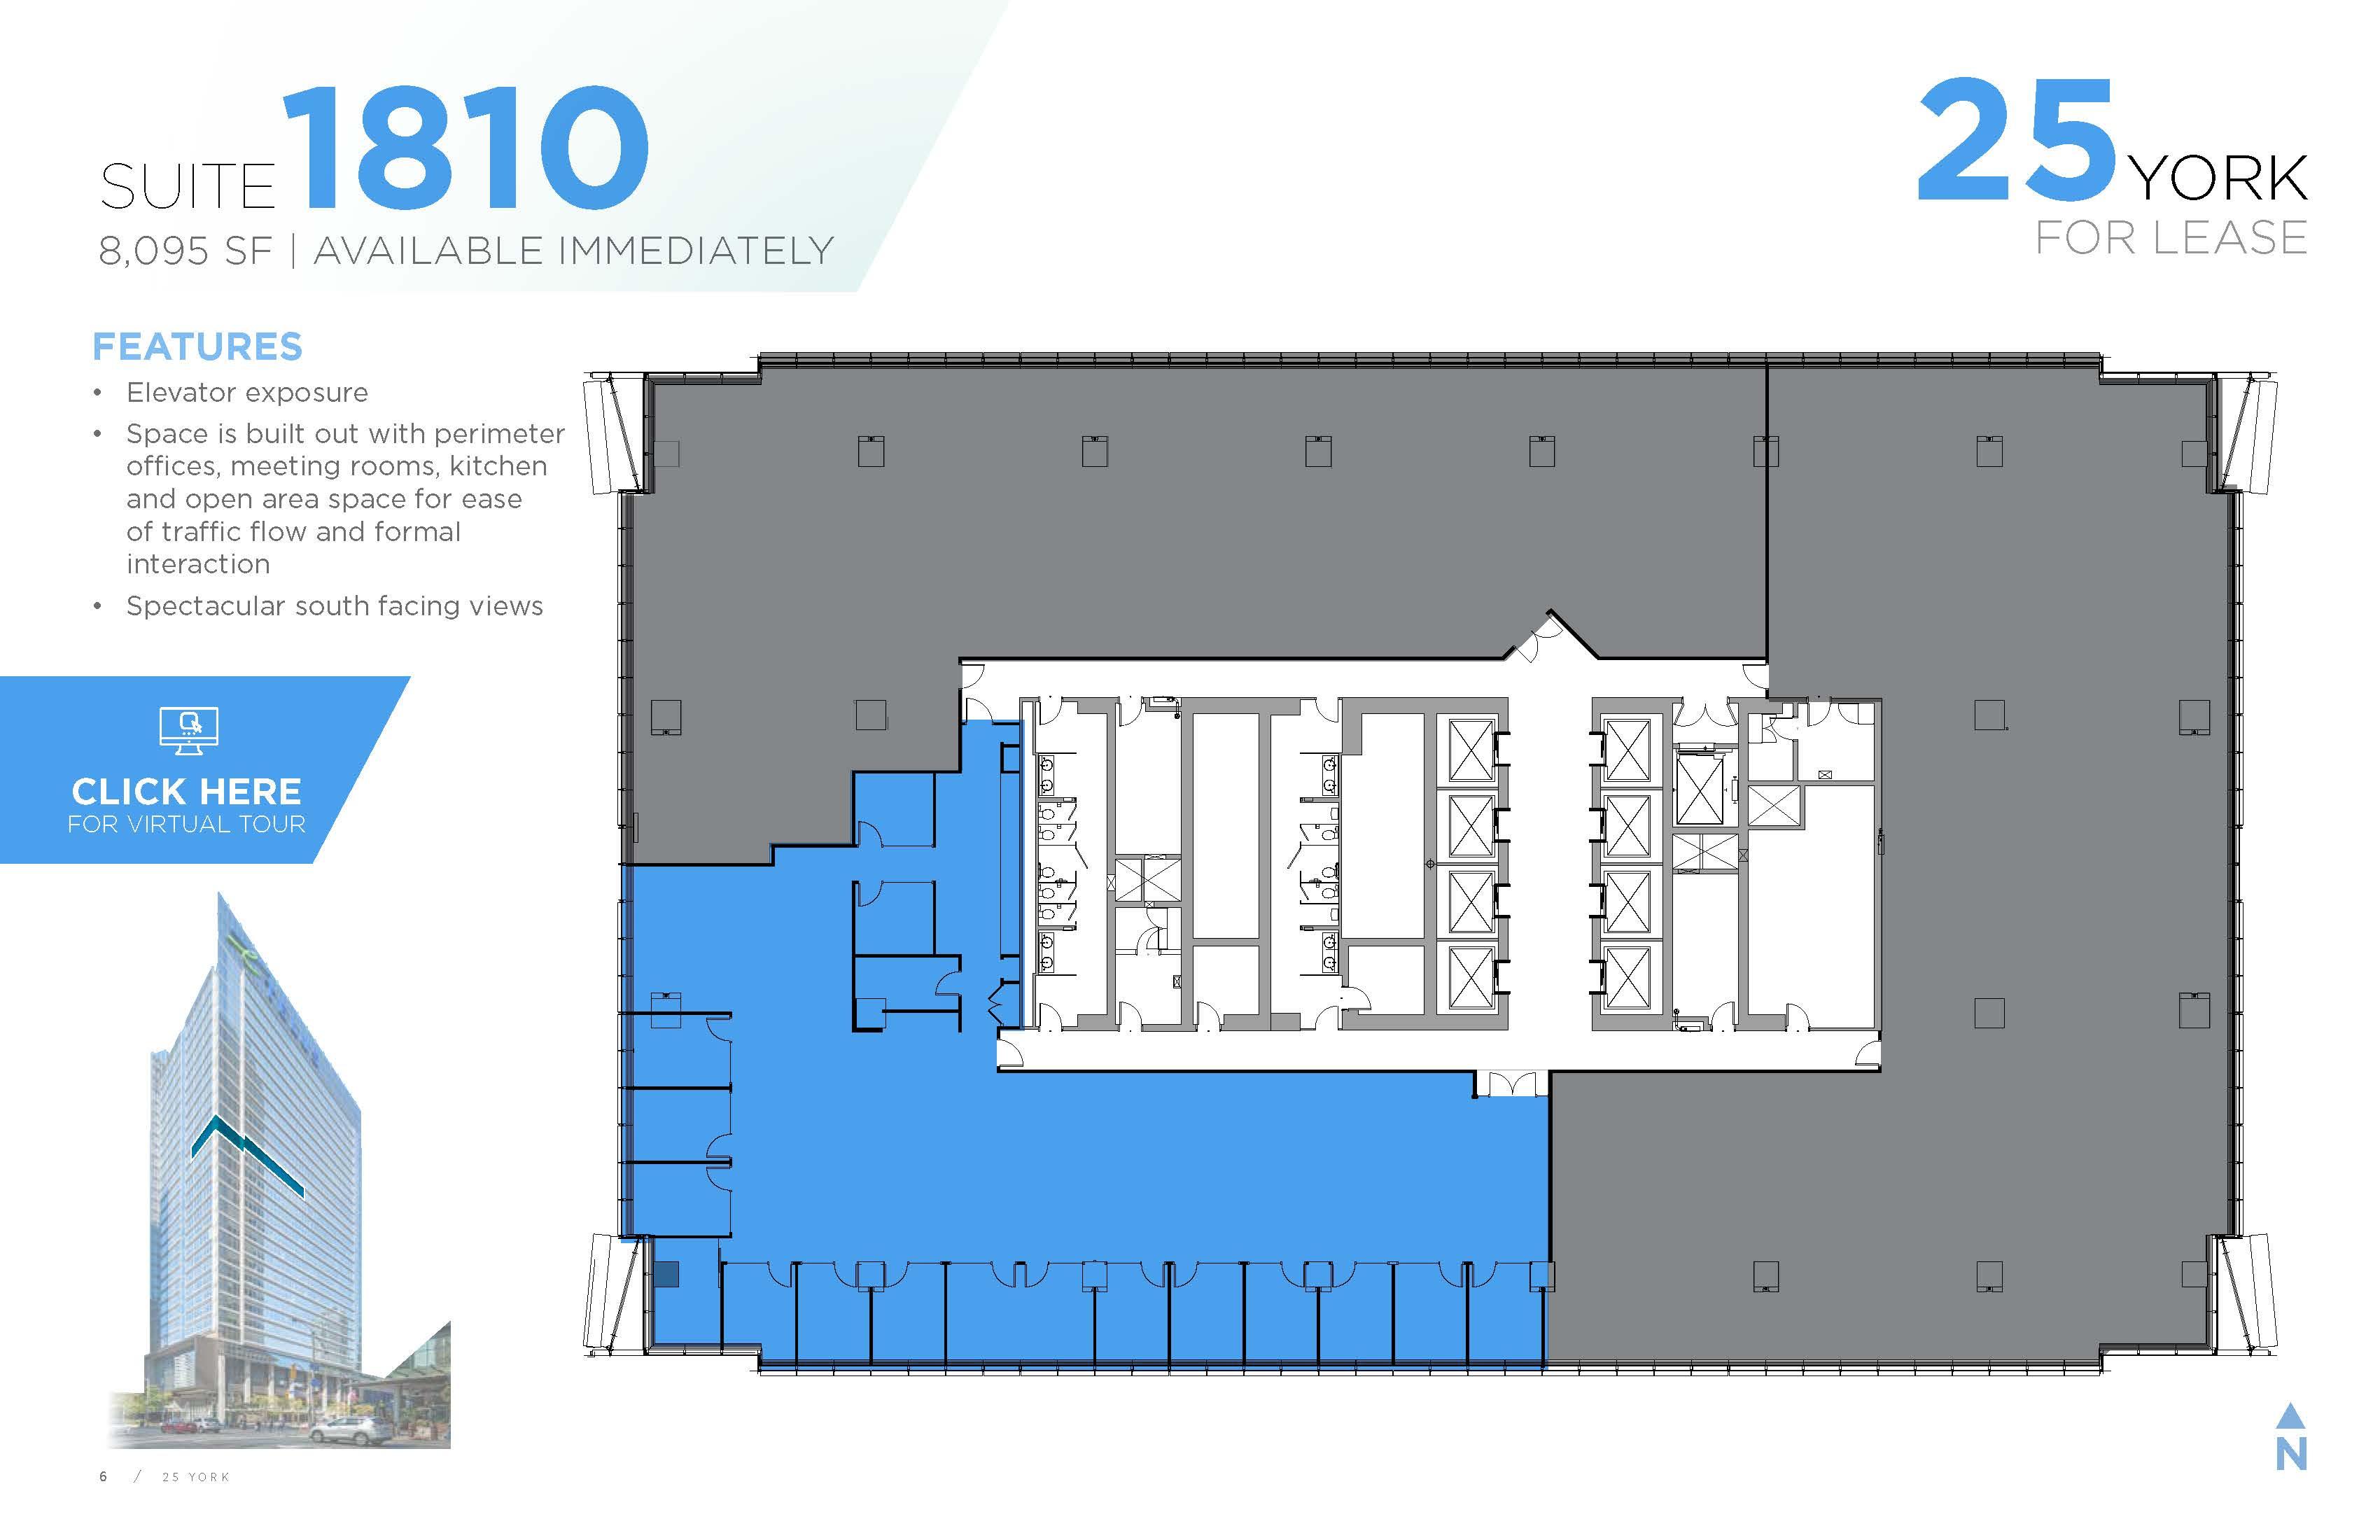 Floorplan thumbnail of Suite 1810